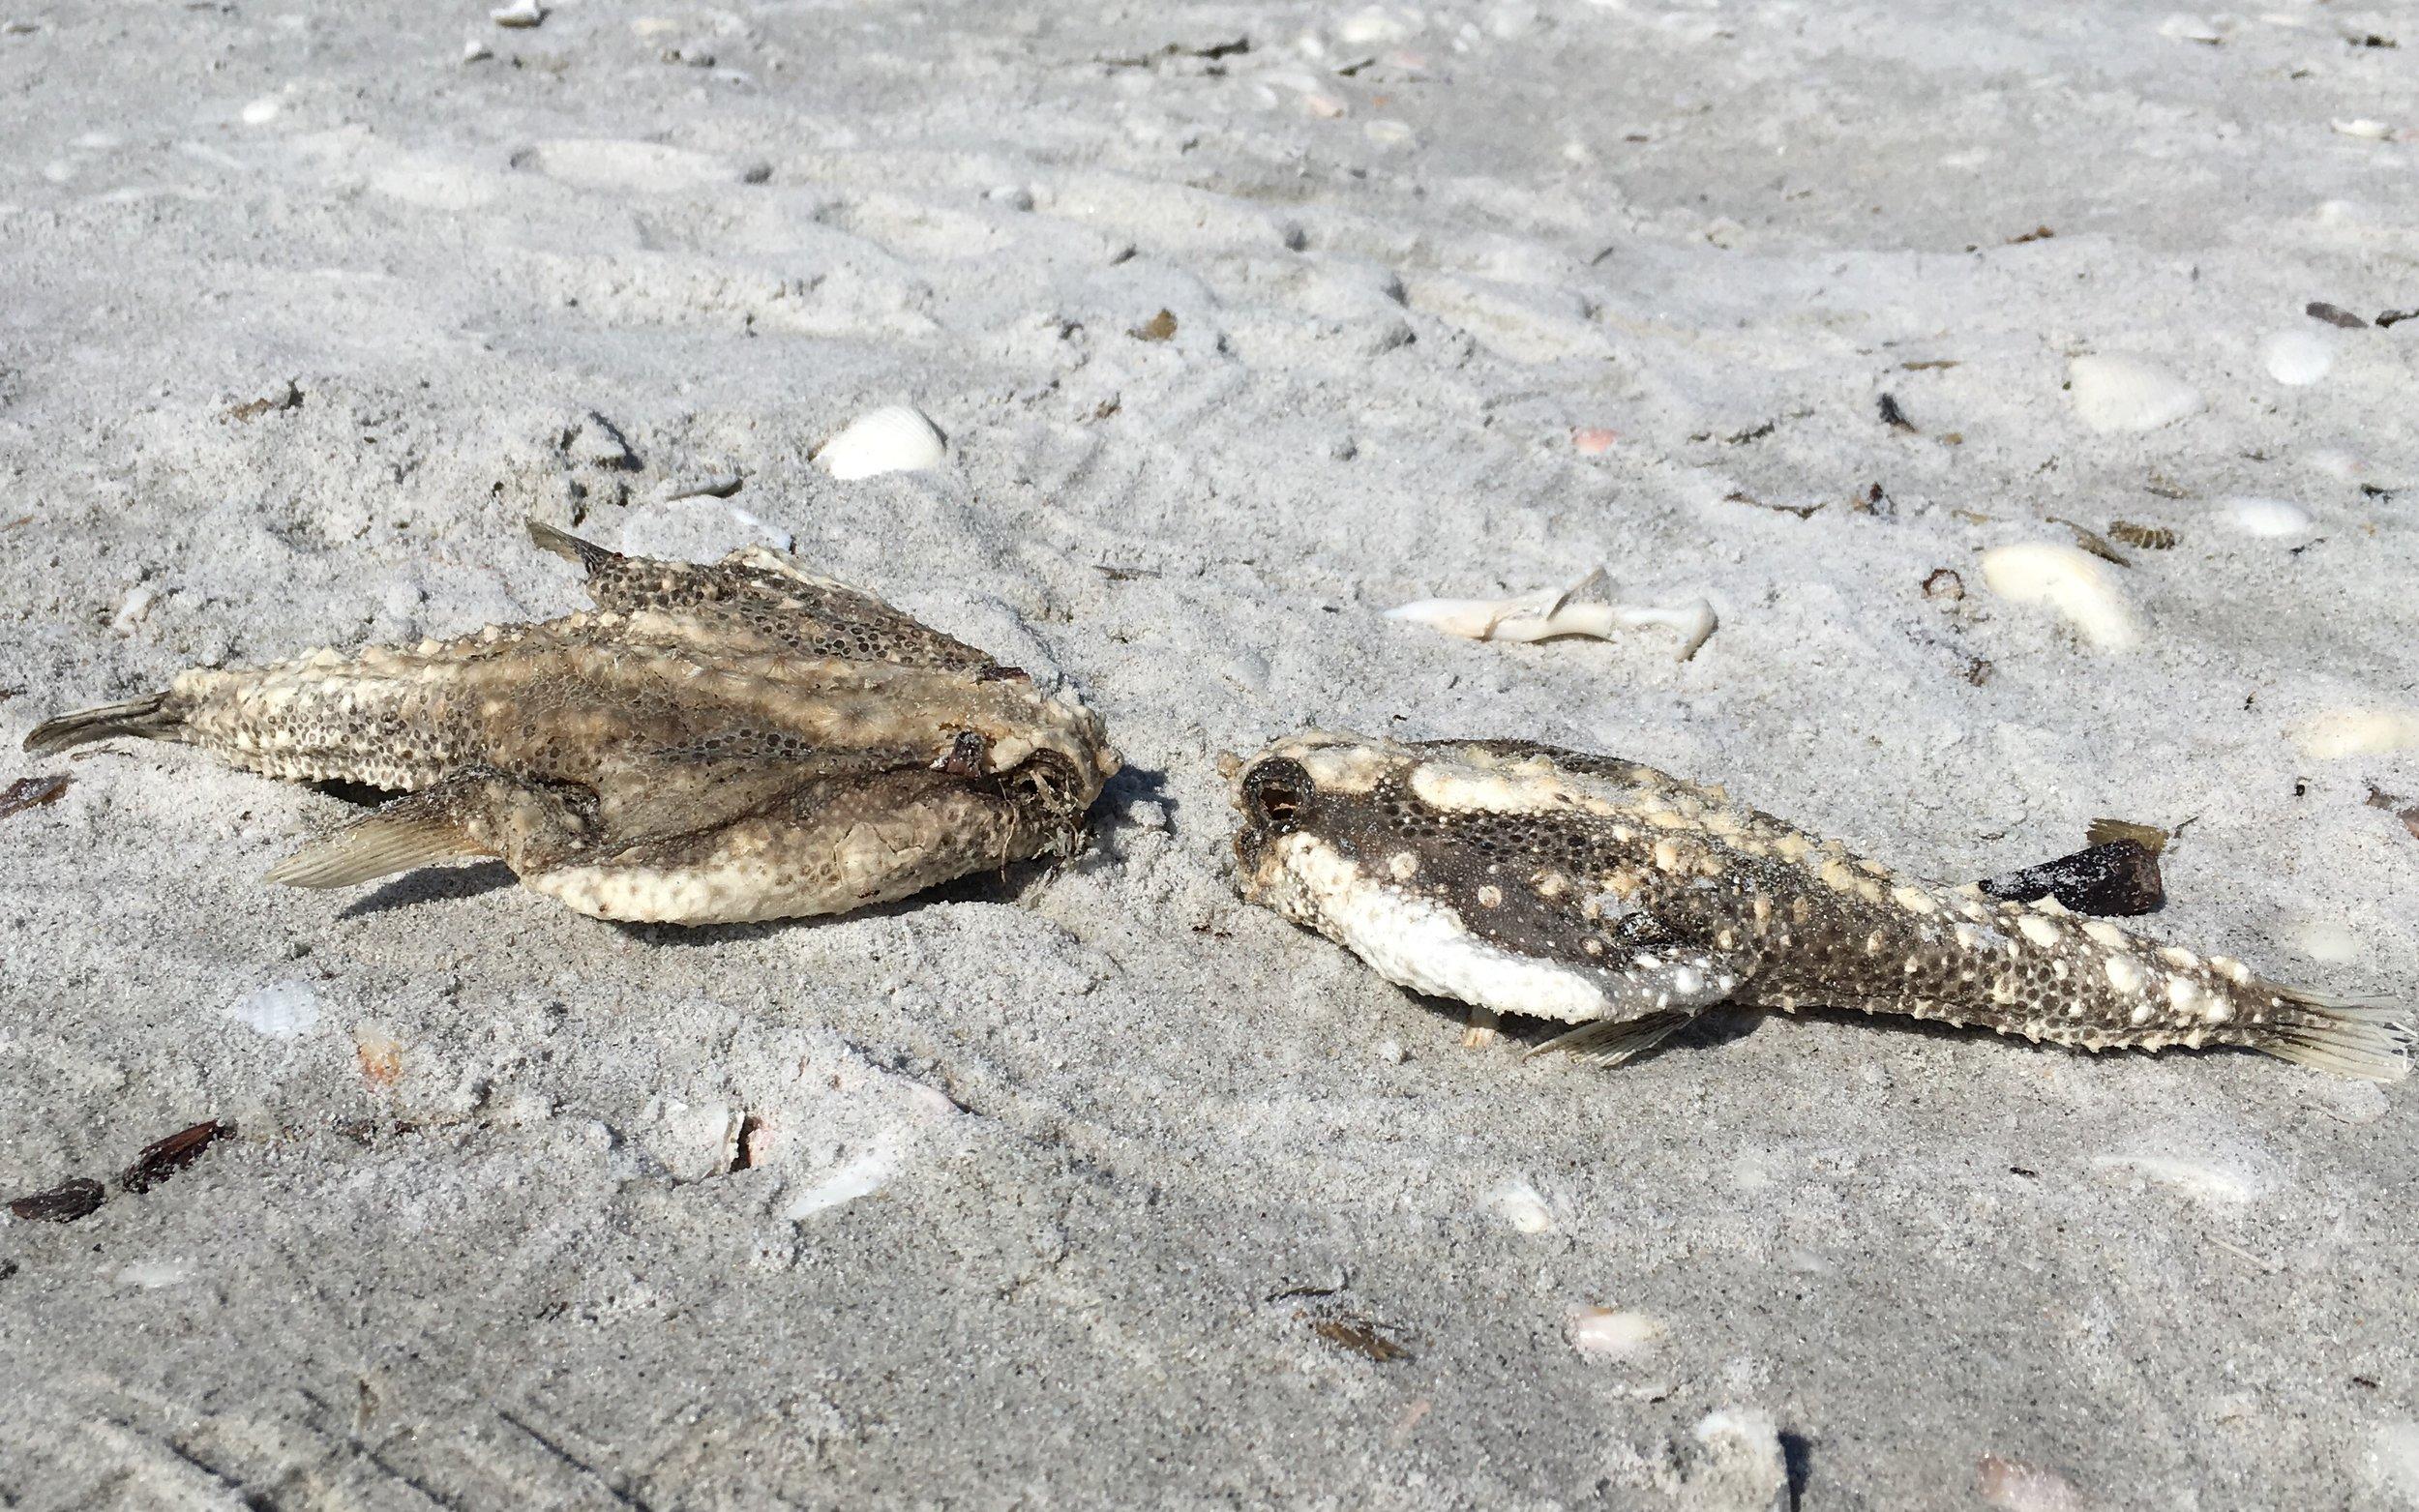 Two batfish found on the beach near Sundial Resort on Sanibel.